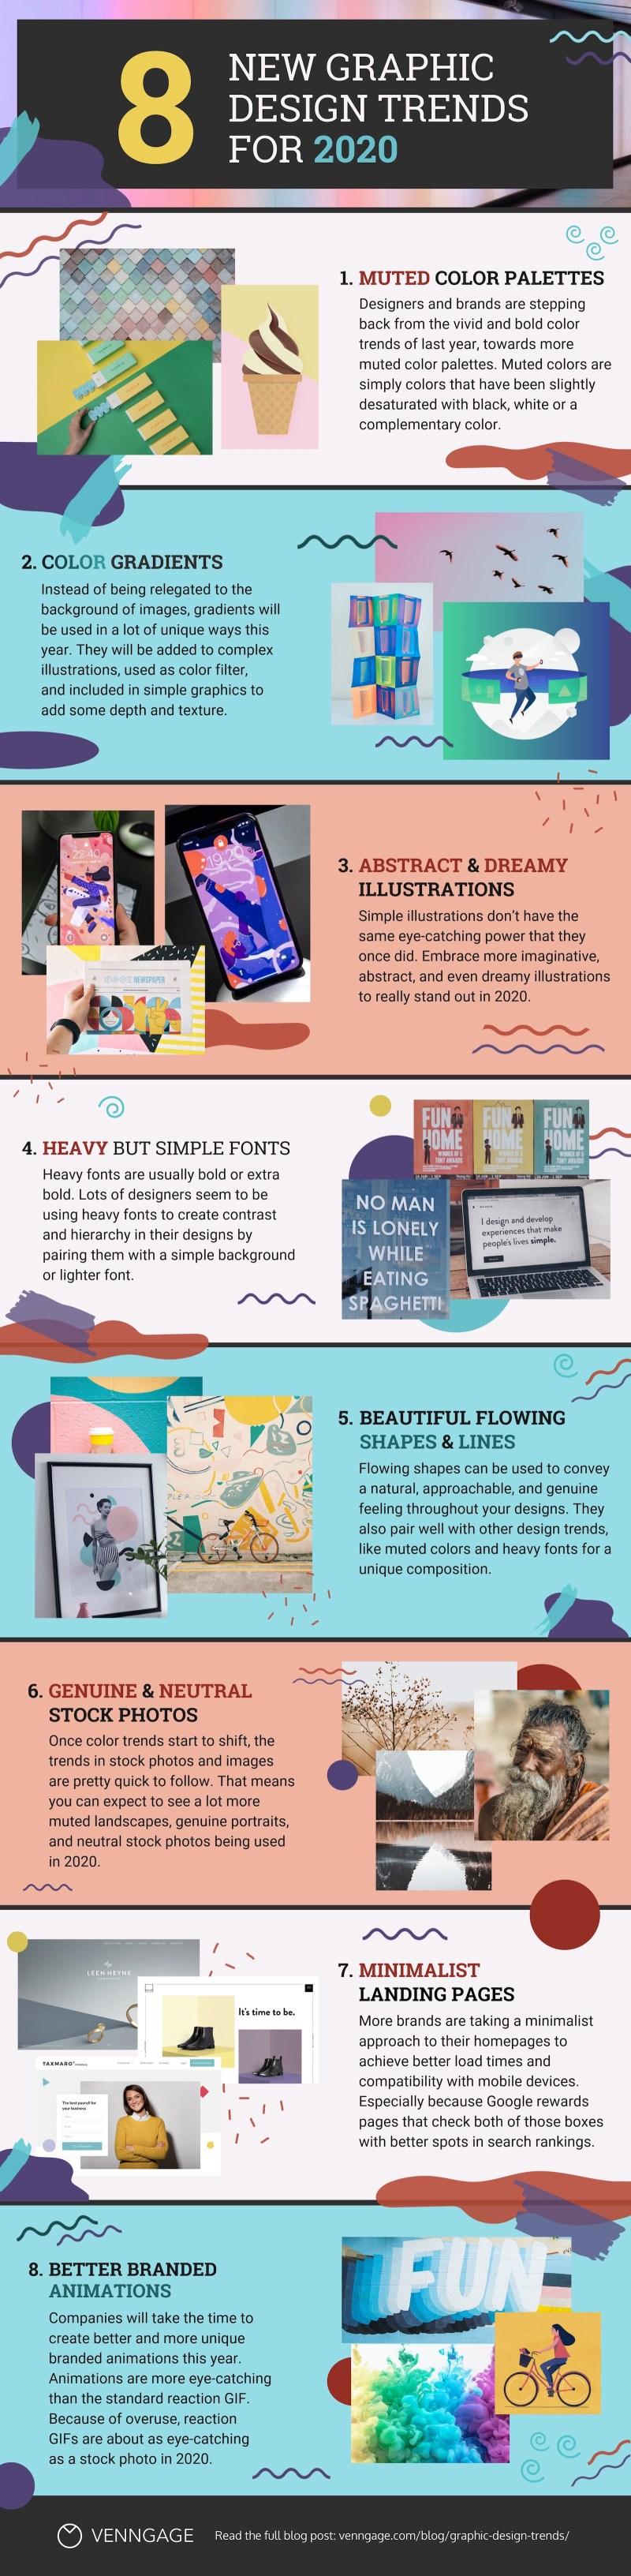 Graphic Design Trends 2020 Infographic